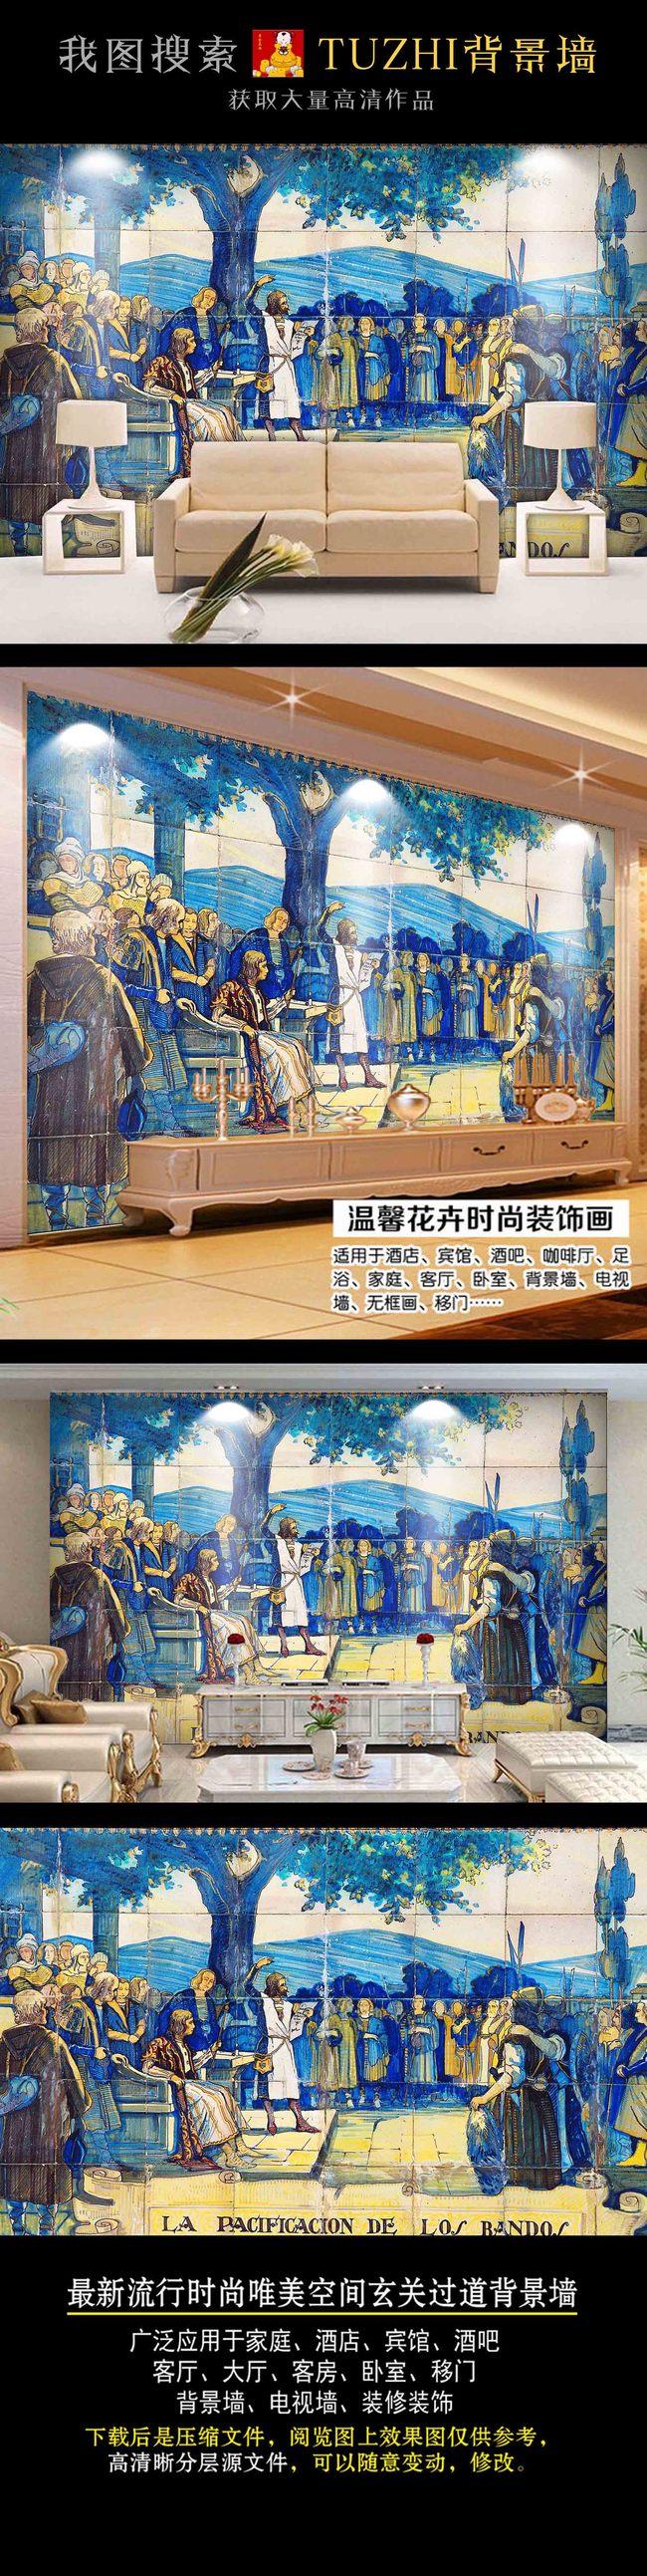 3d瓷砖欧式古典人物风景油画电视背景墙